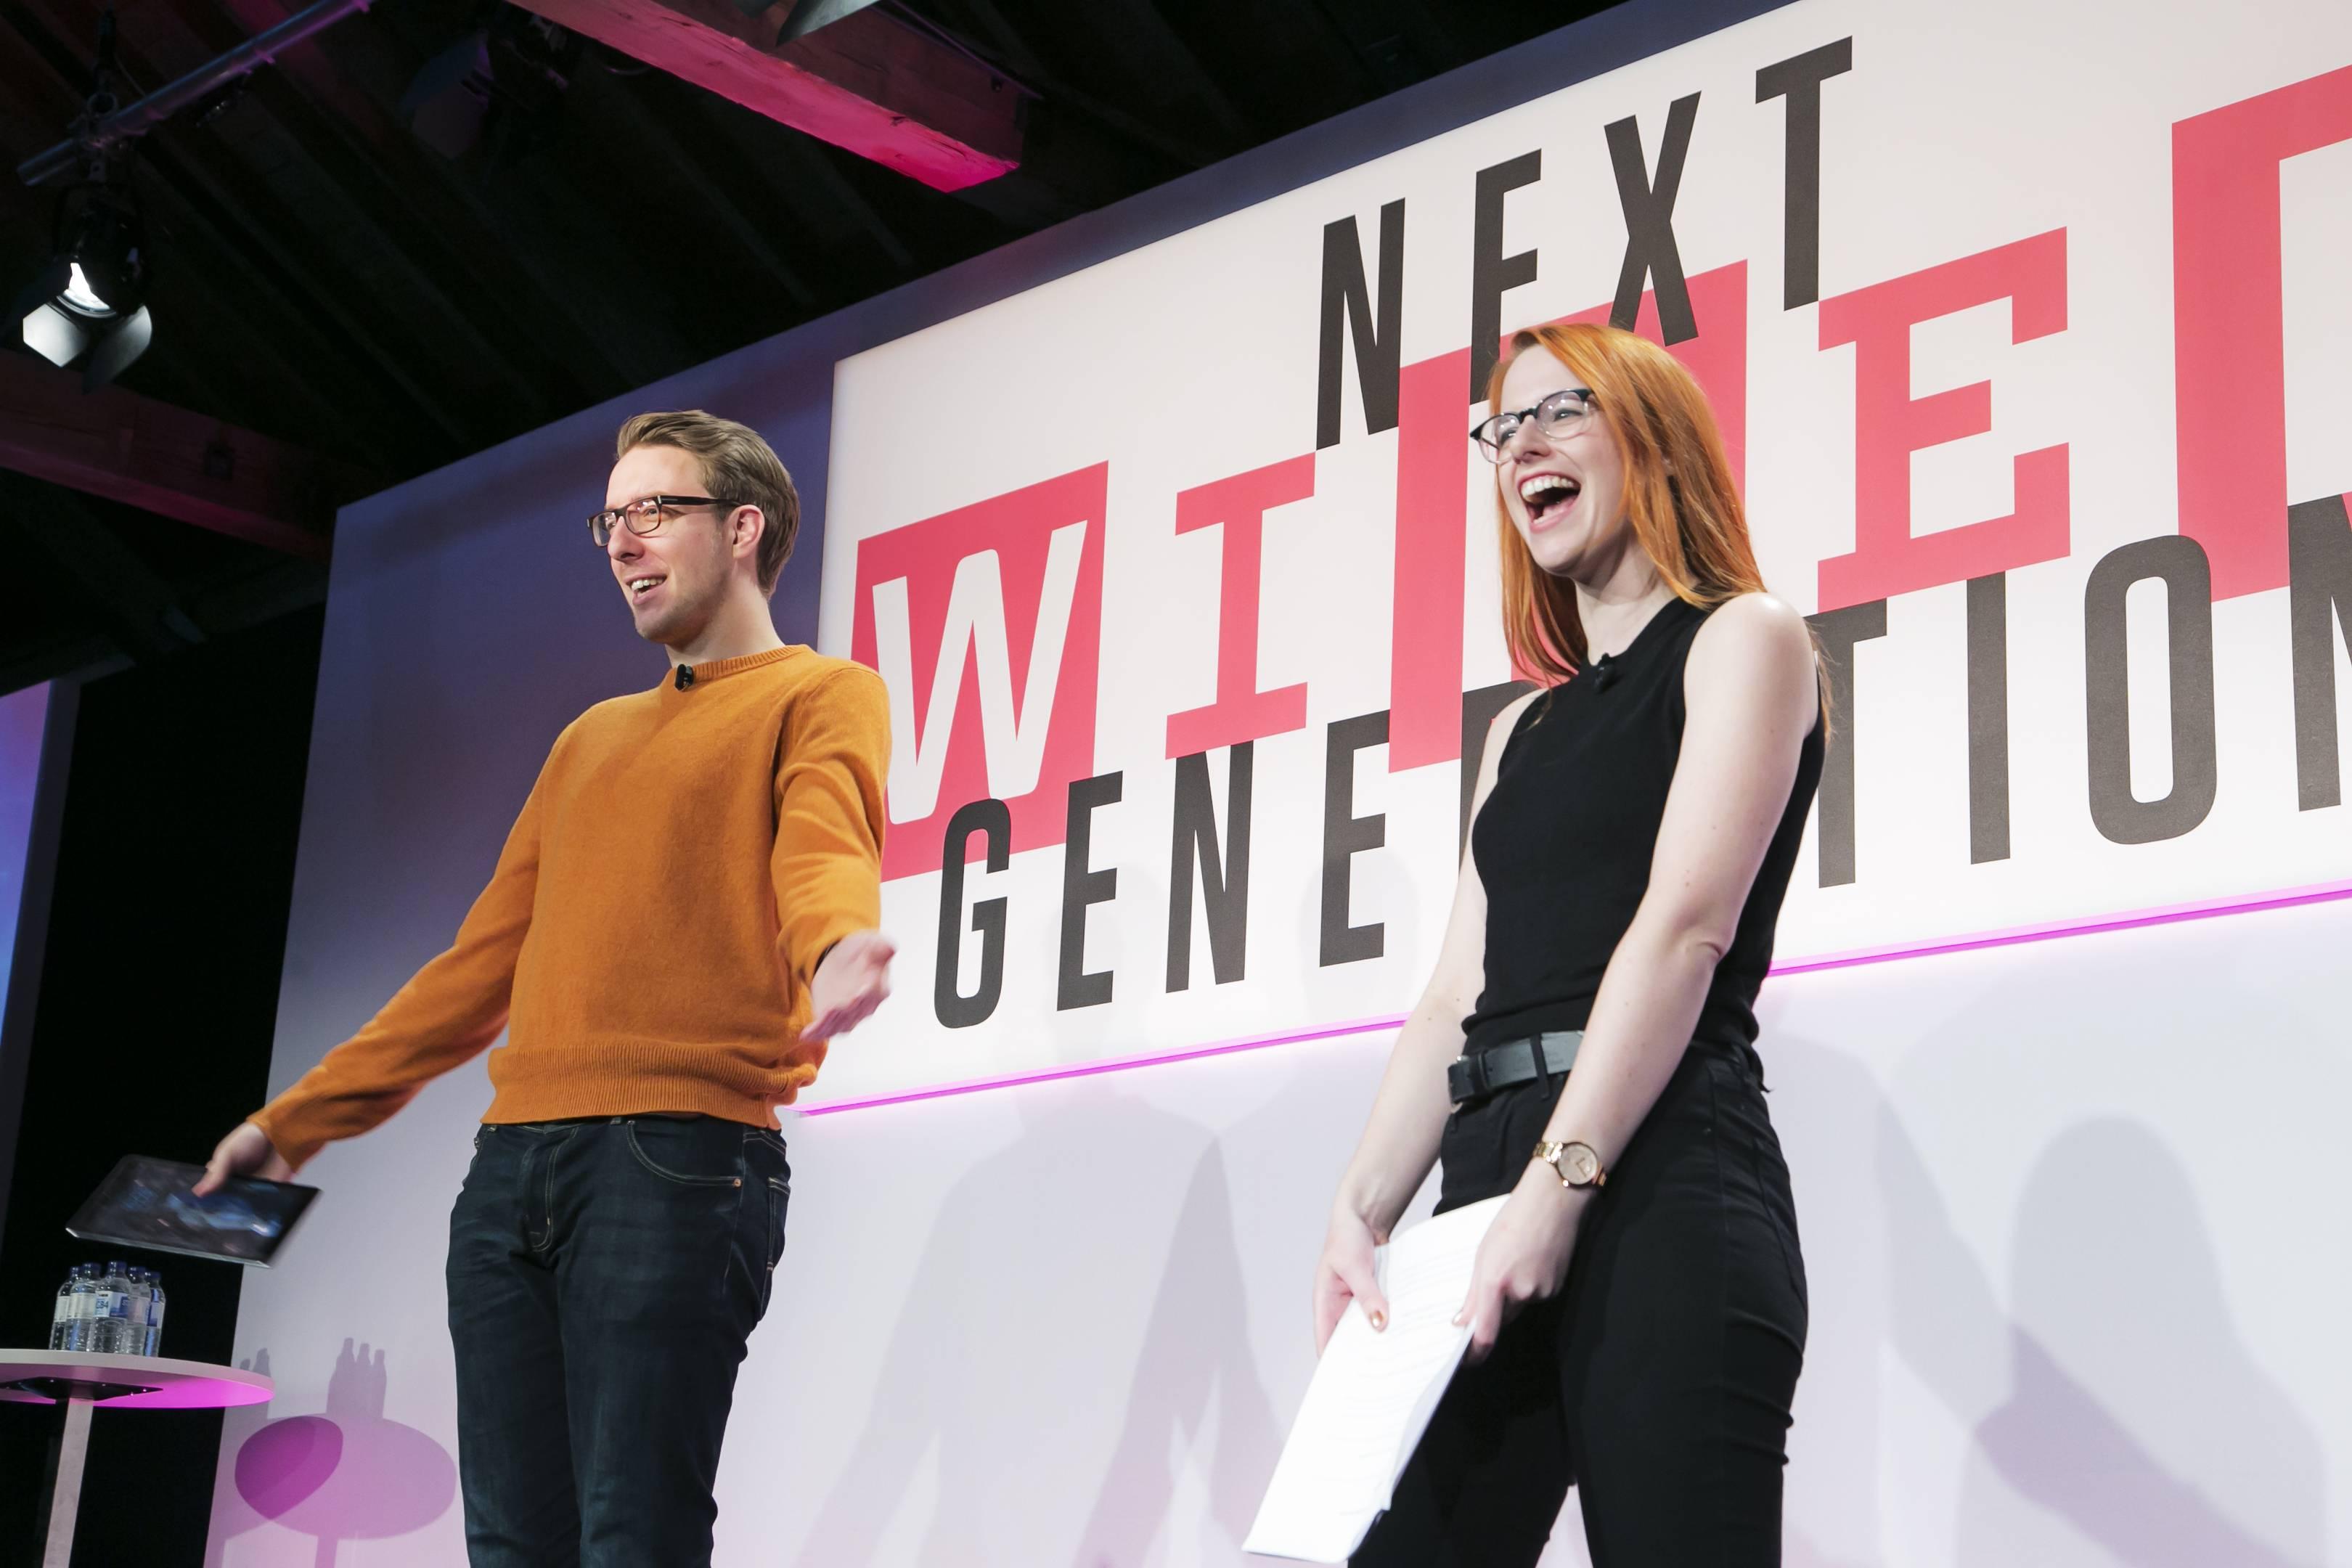 Wired Next Generation | WIRED UK